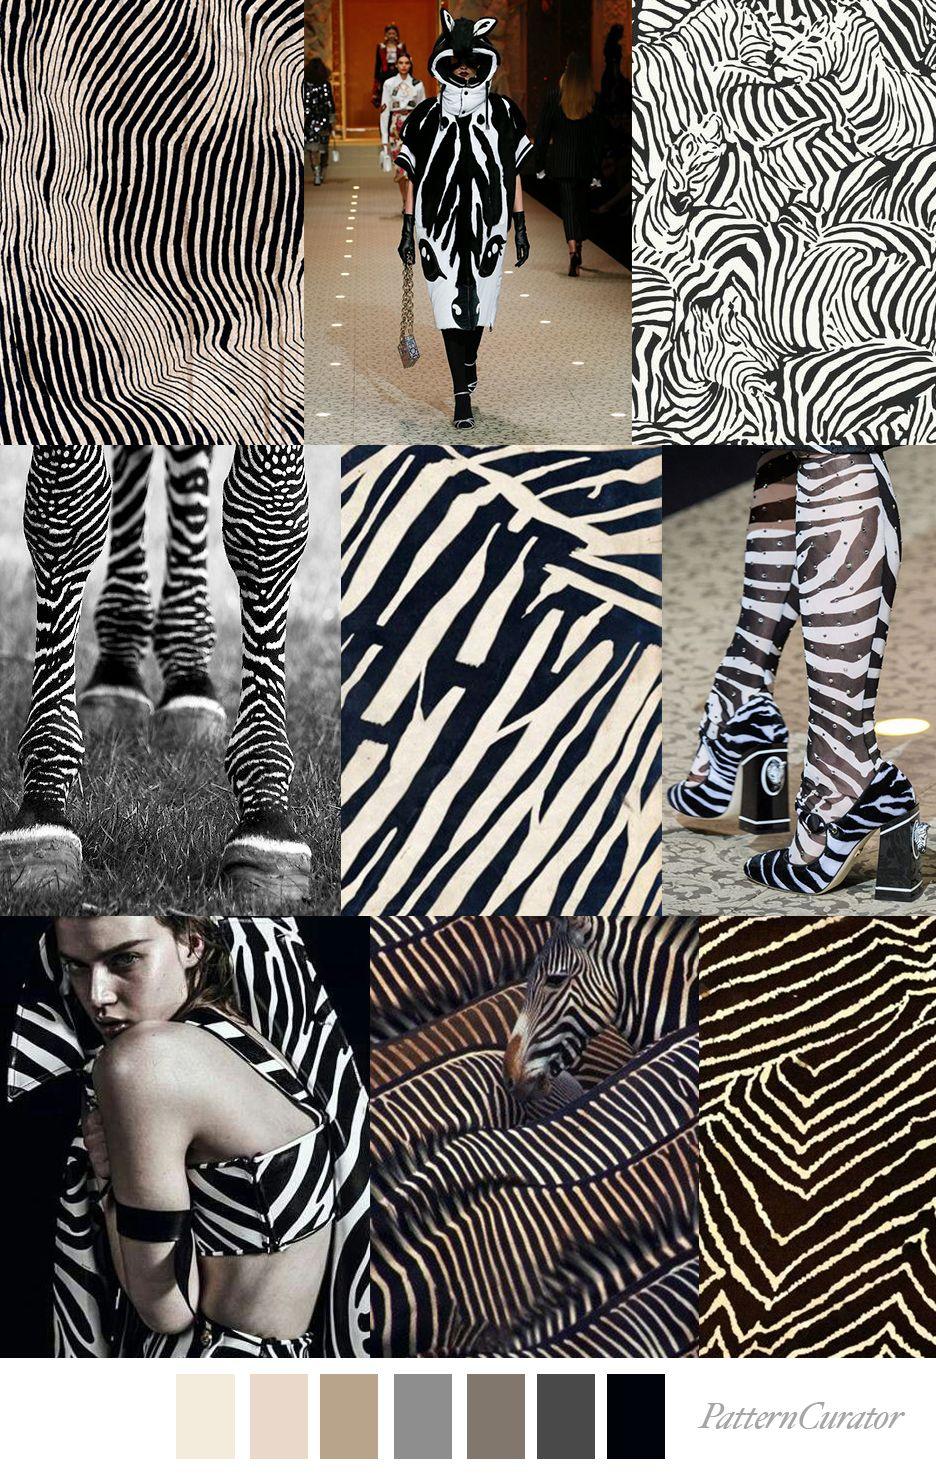 ZEBRA LINES in Fashion Trends Pinterest Fashion Fashion